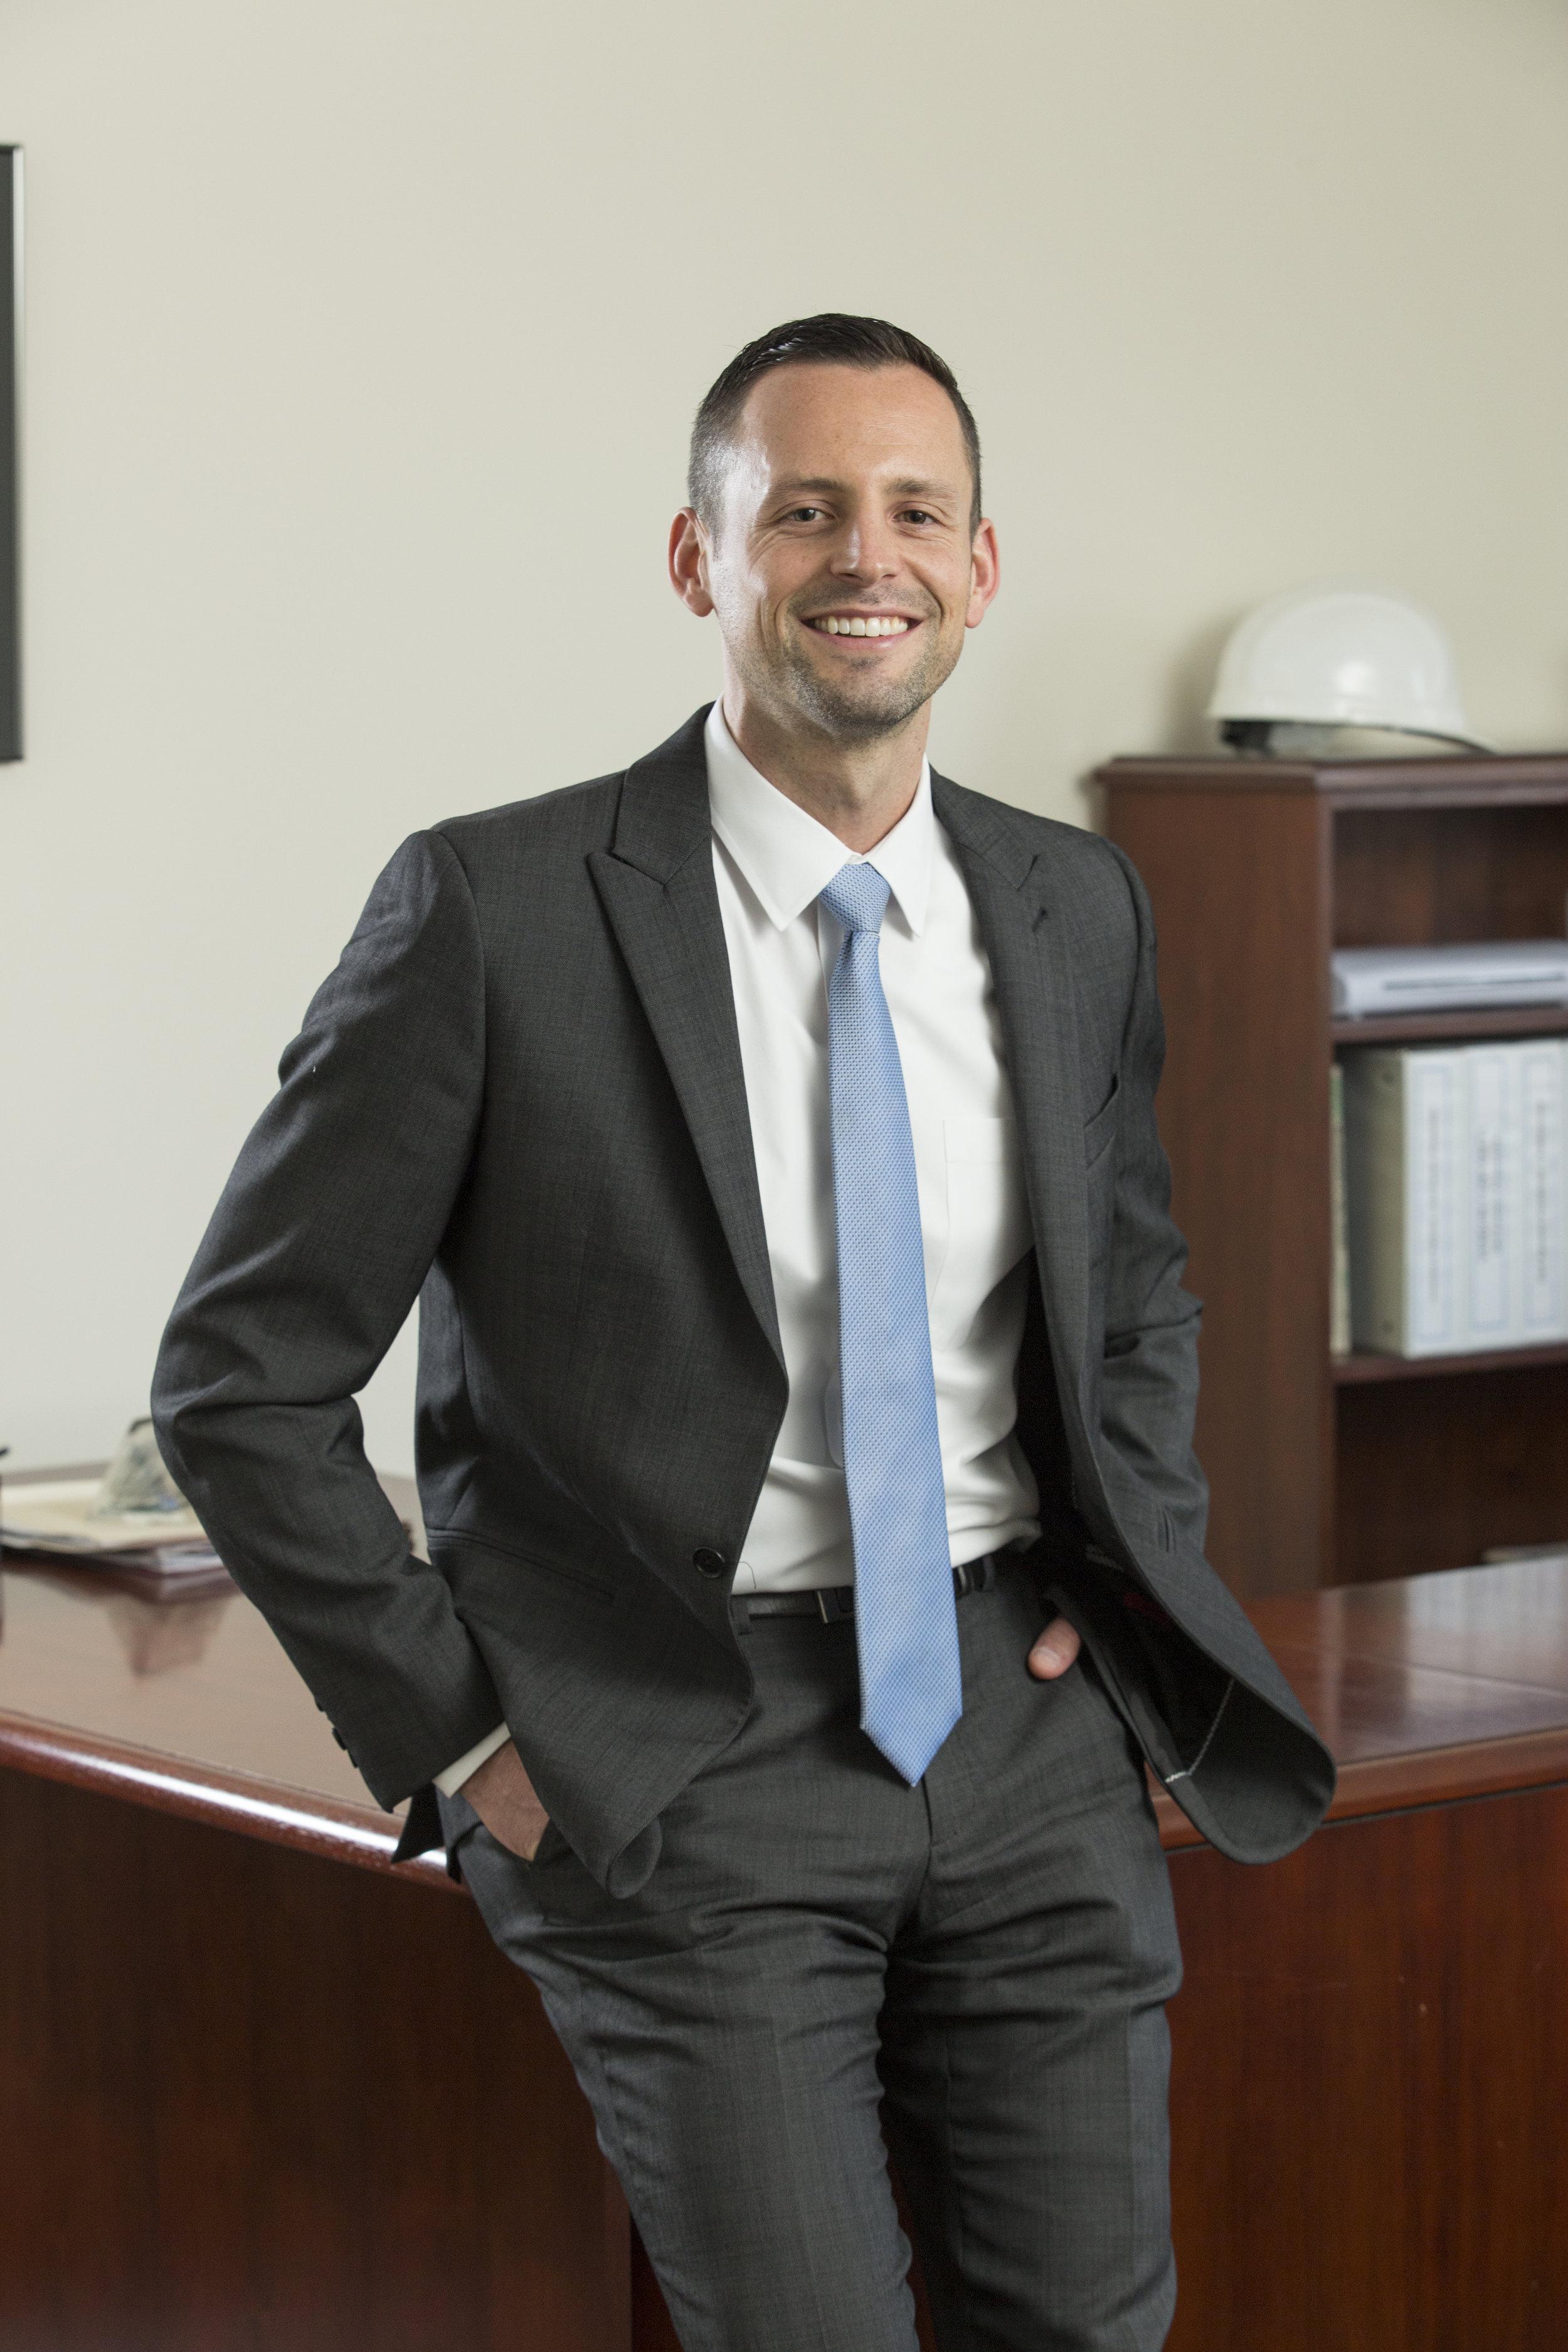 JUSTIN KEARNEY - Director, Market Development and Support